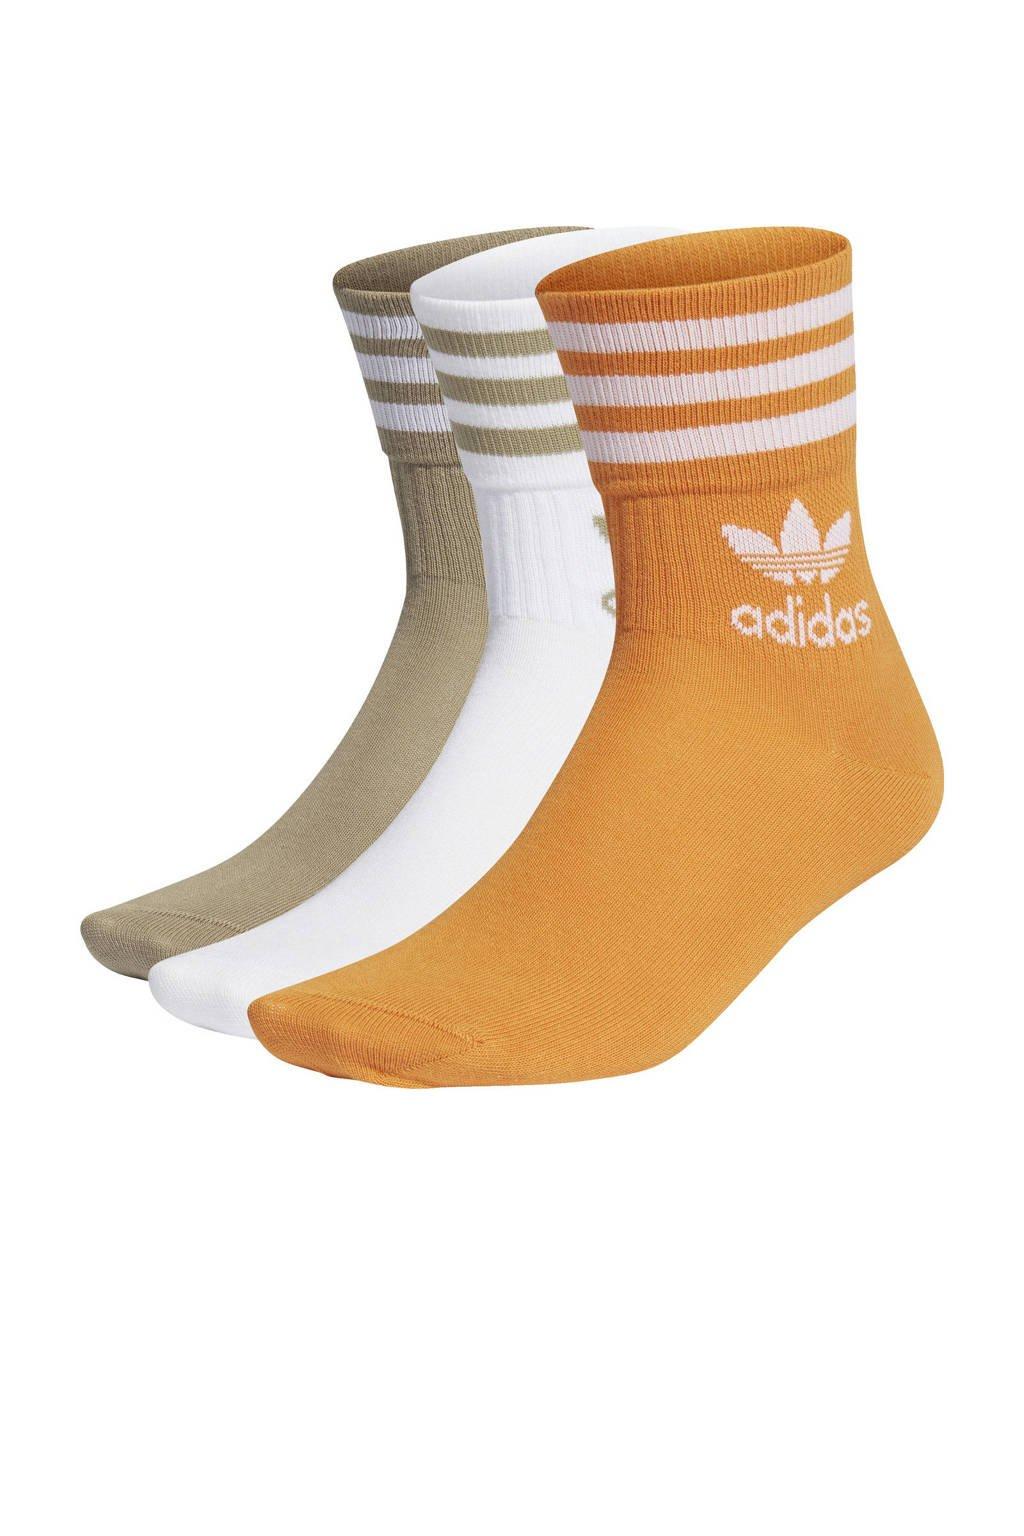 adidas Originals Adicolor sokken - set van 3 wit/oranje/kaki